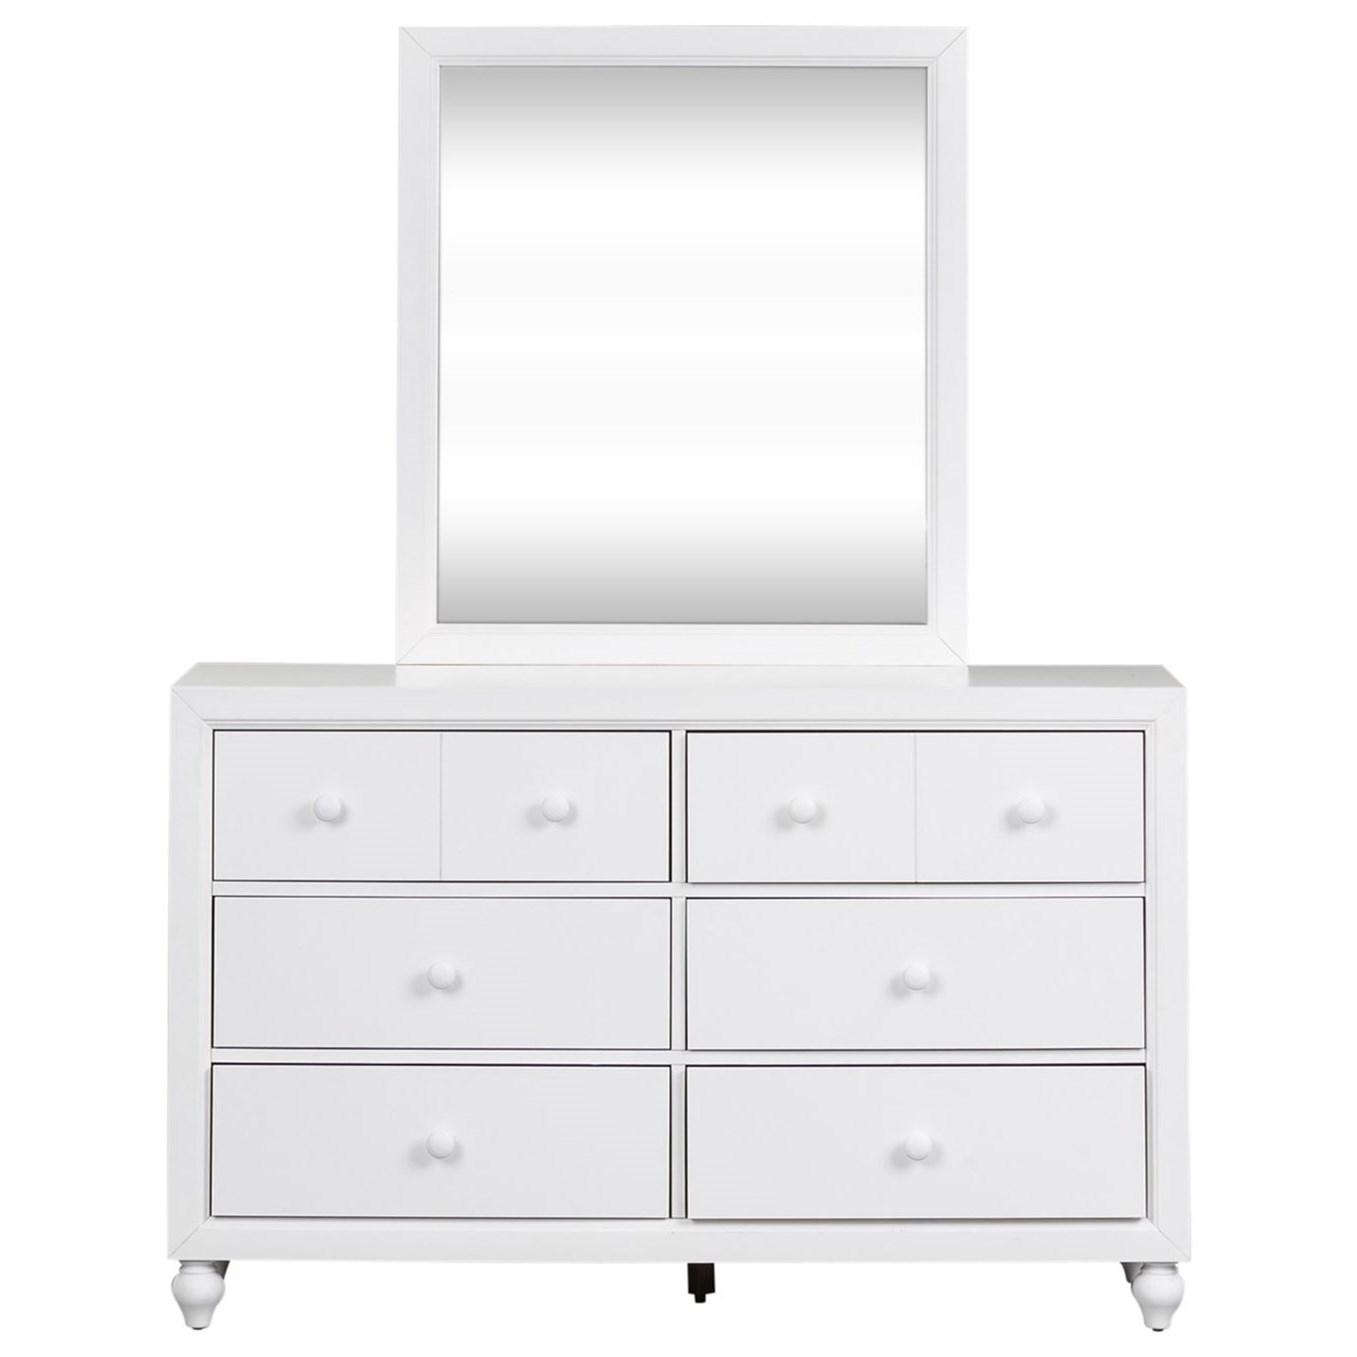 Cottage Style Dresser and Mirror Set with Bun Feet